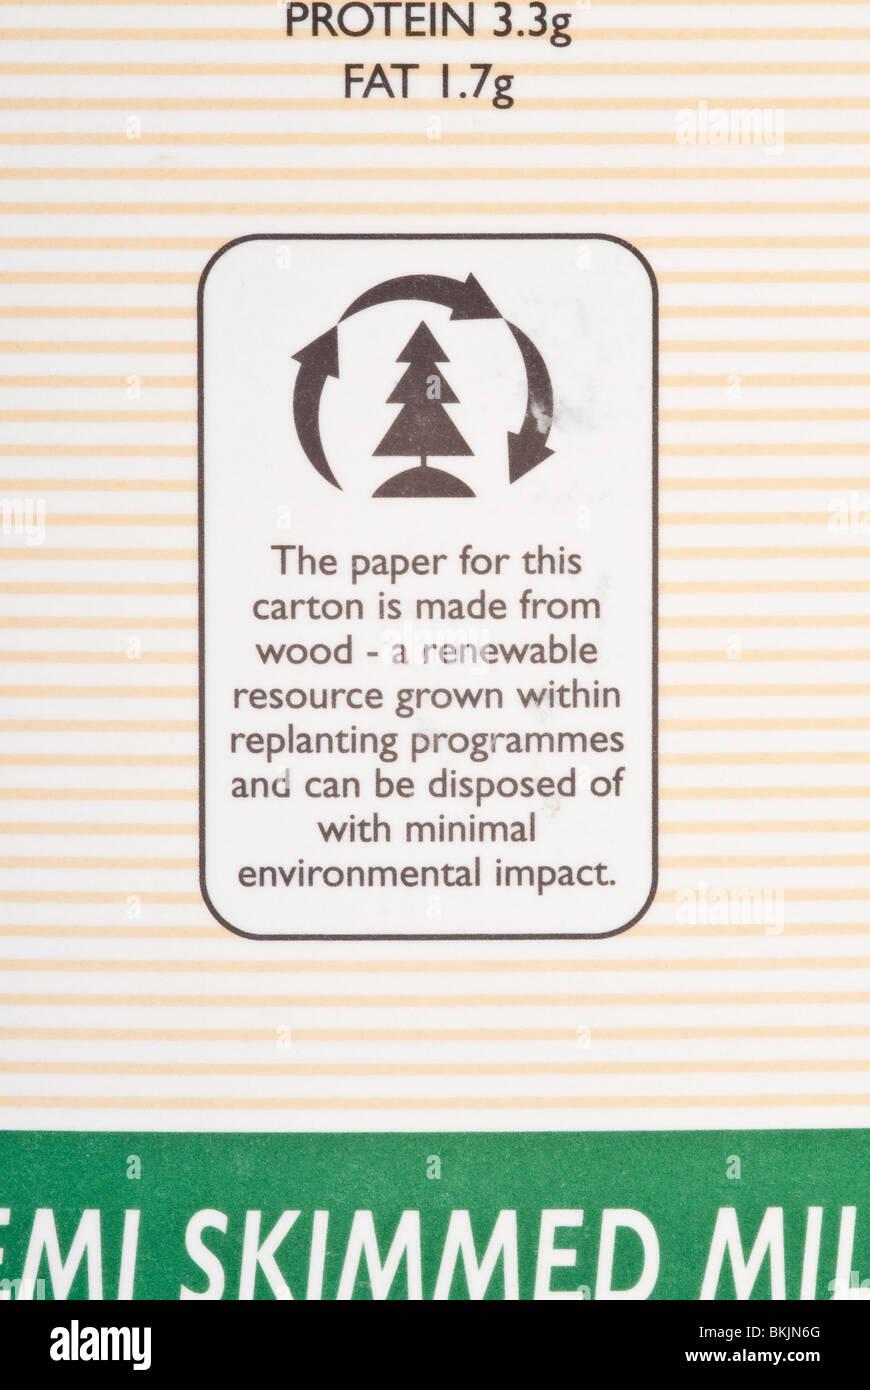 Made From Renewable Recourses Label on Carton of Organic Milk Stock Photo